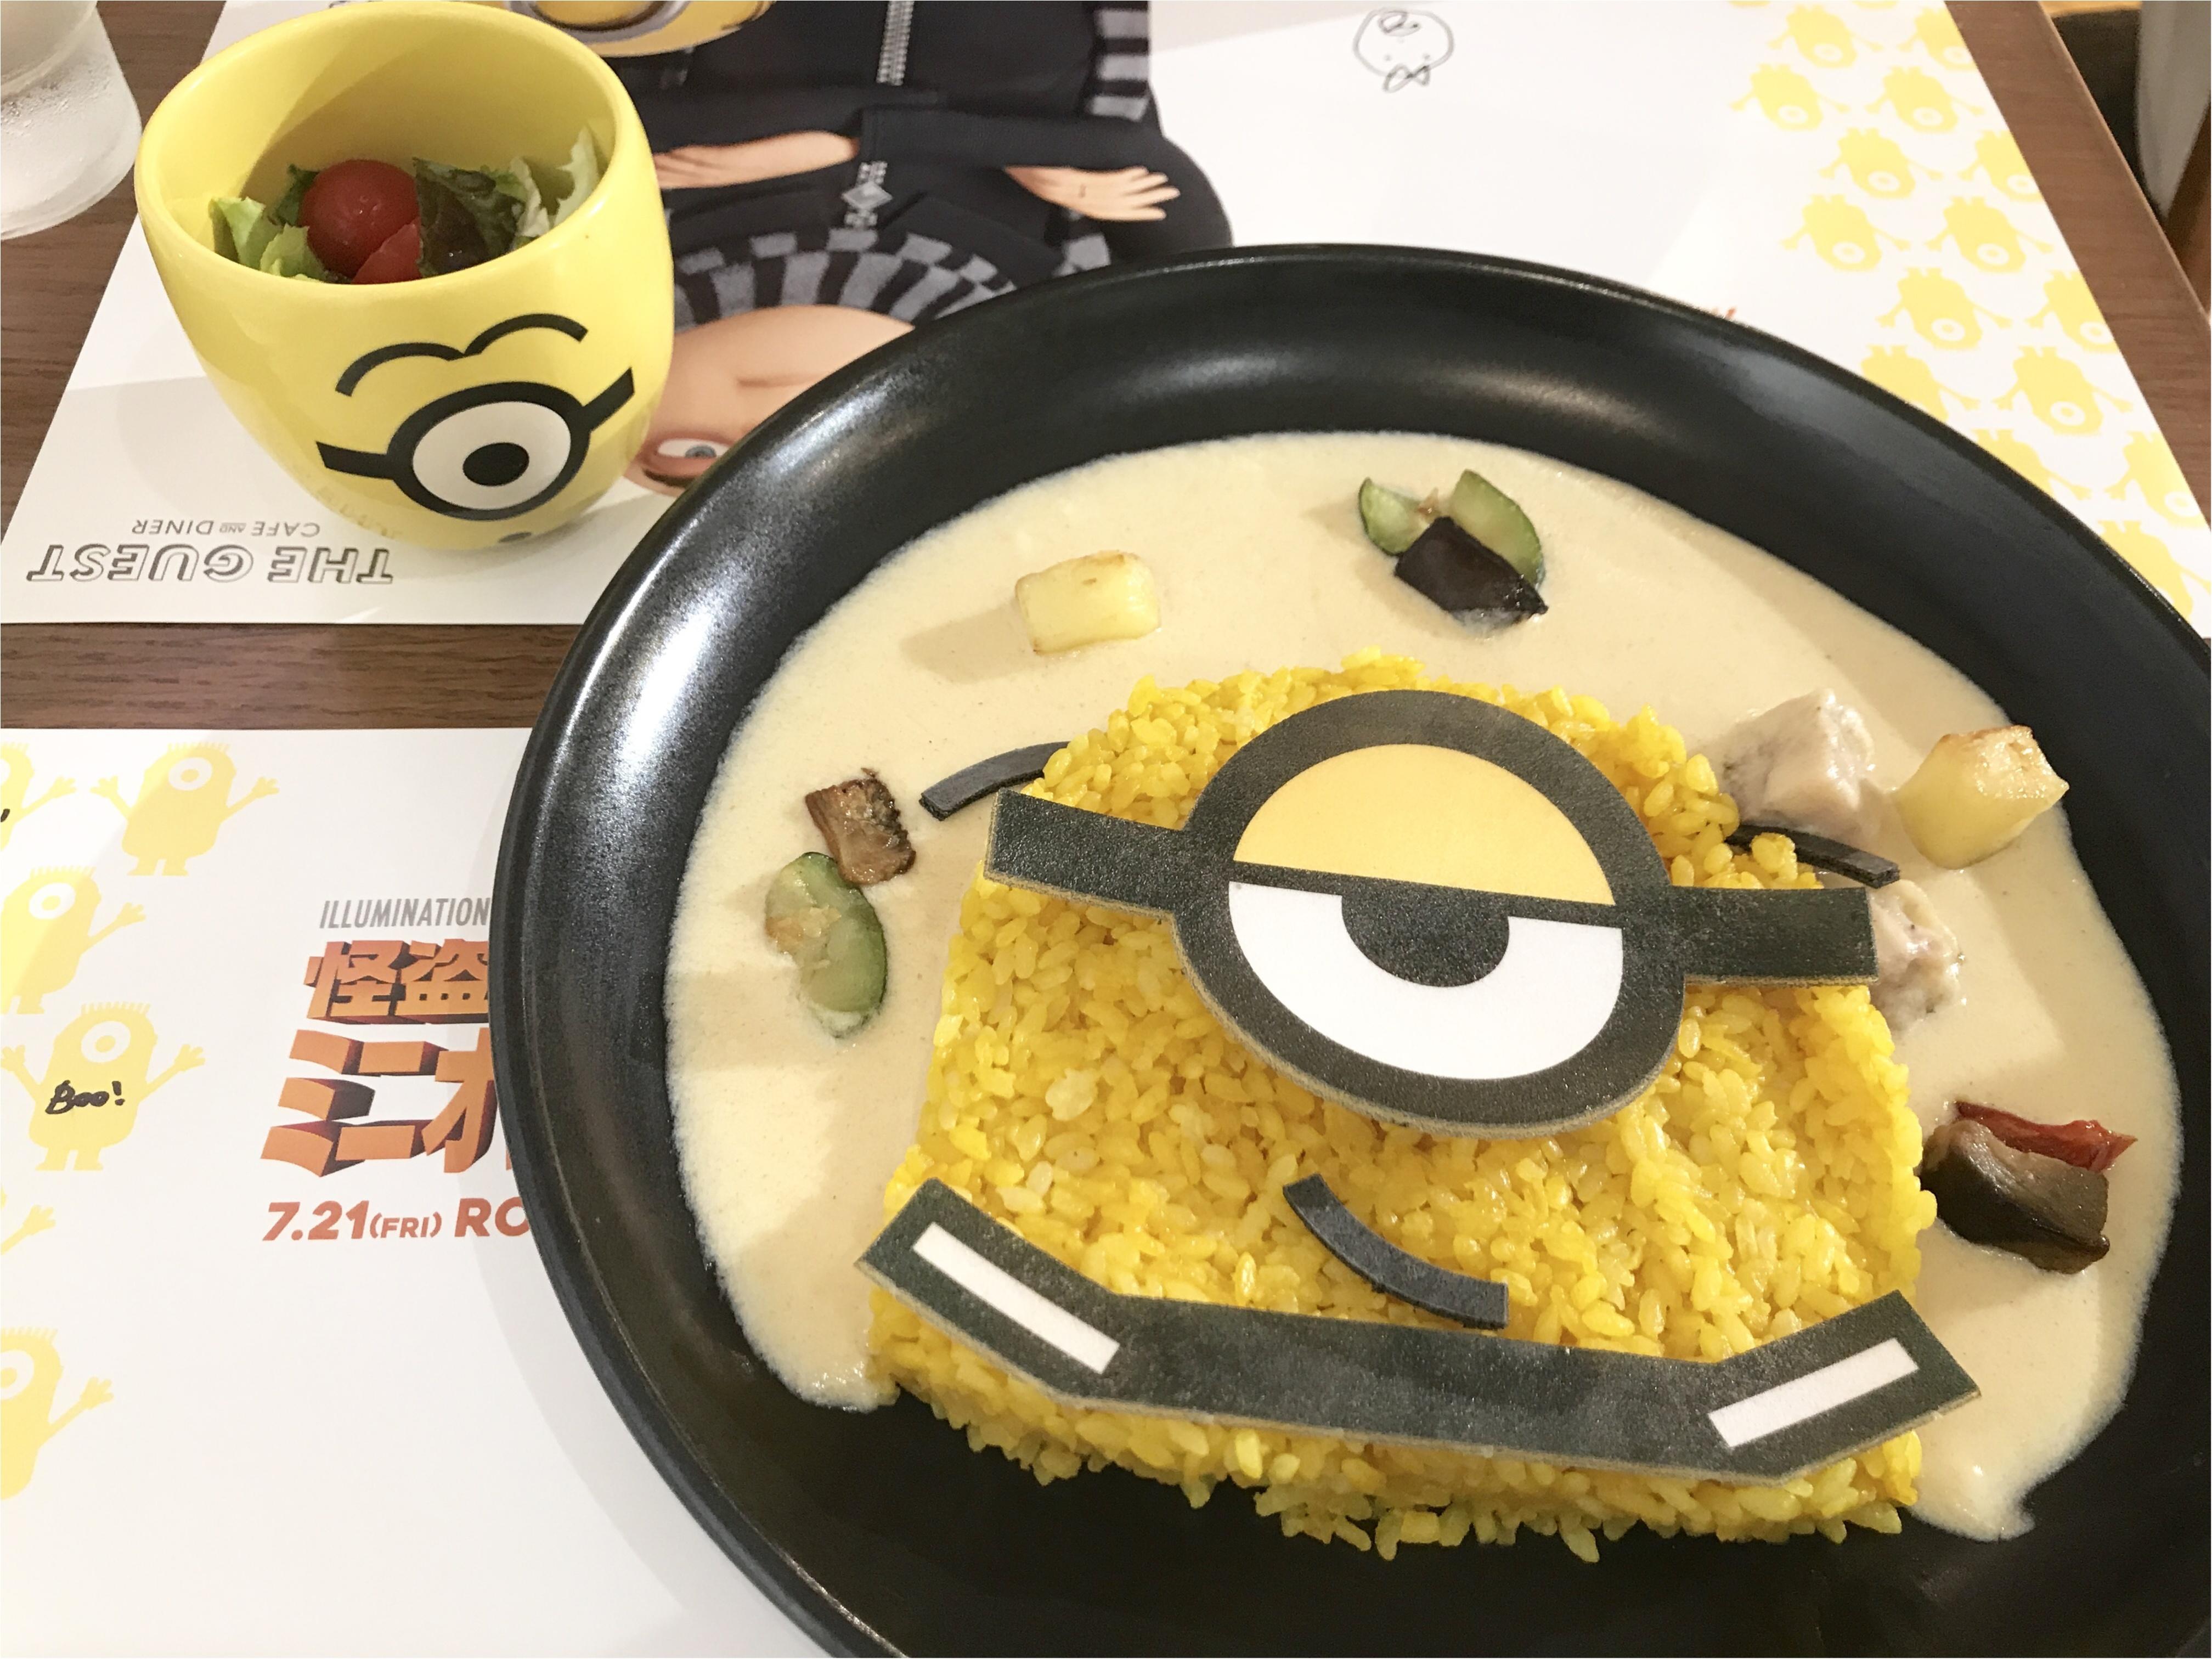 【FOOD】夏休みのおでかけに!怪盗グルーのミニオン大脱走 #ミニオンカフェ に行ってきました★_4